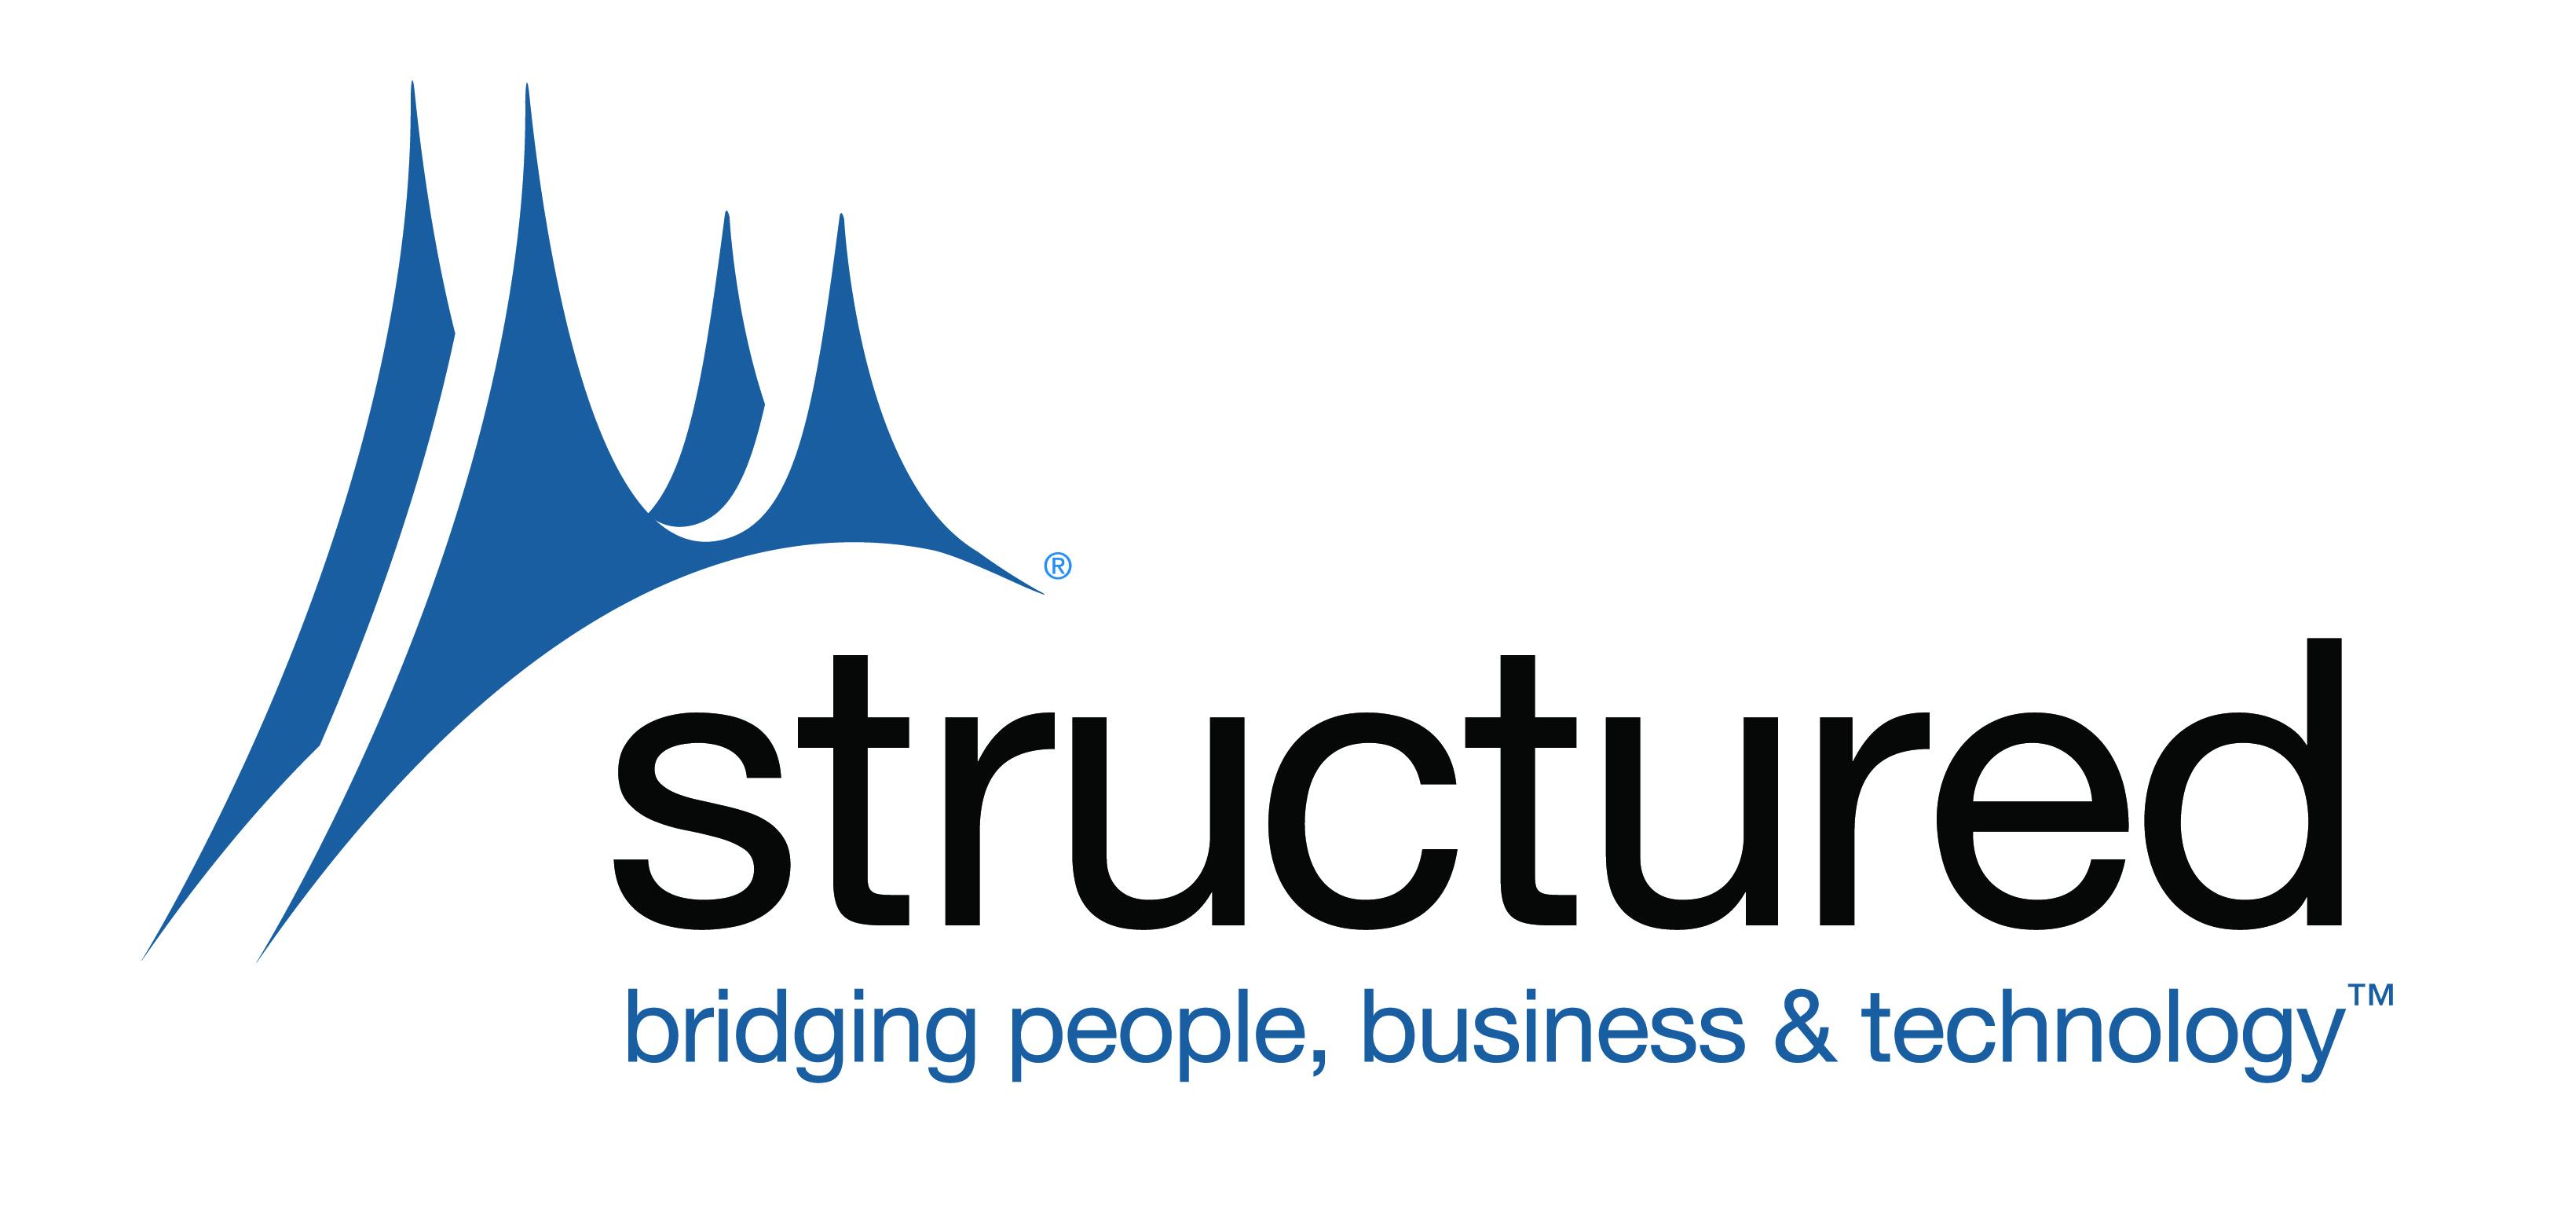 structured_logo.jpg - 1.53 Mb